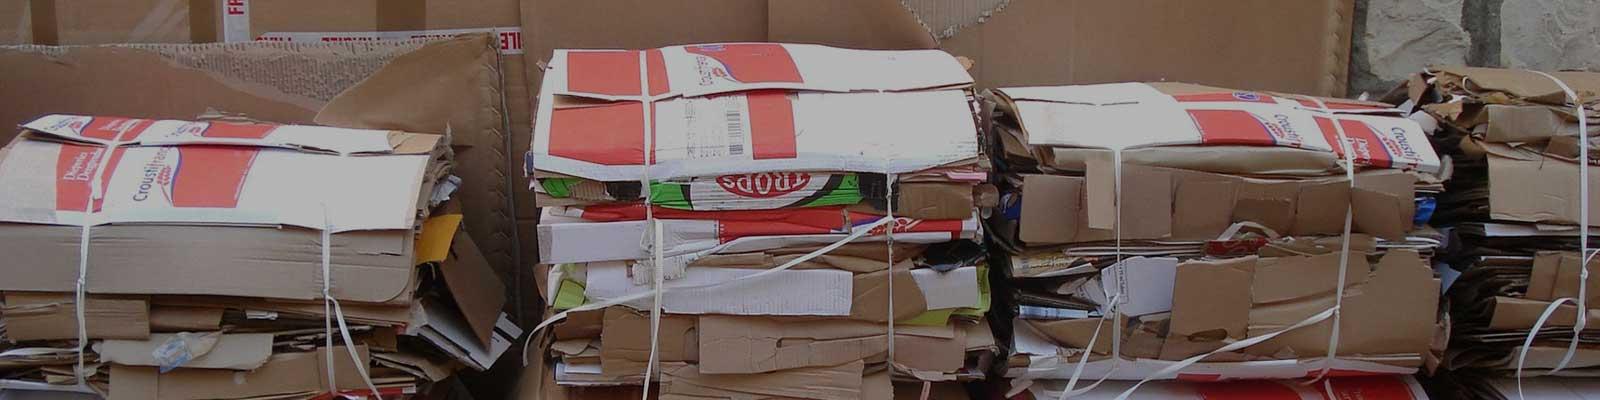 cartons3.jpg